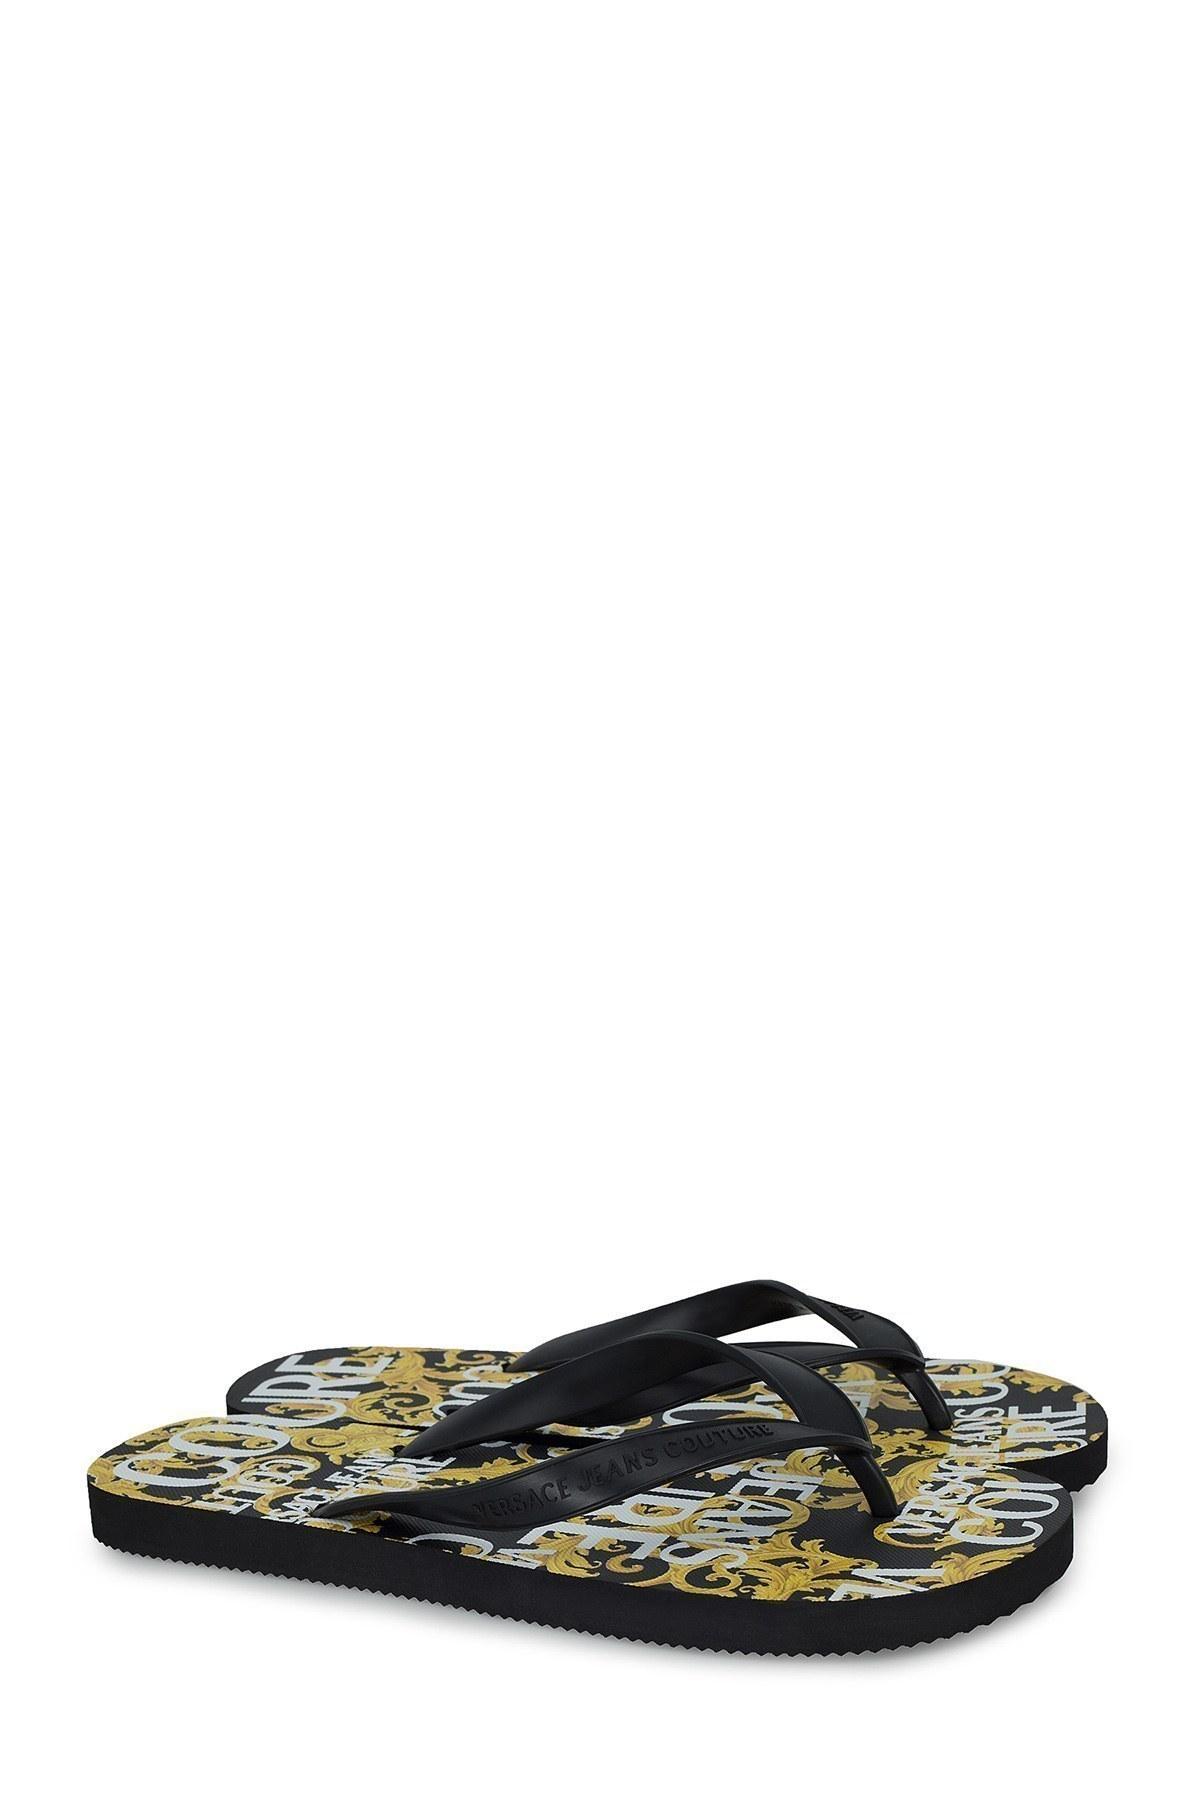 Versace Jeans Couture Terlilk Erkek Terlik E0YVBSQ8 71404 899 SİYAH